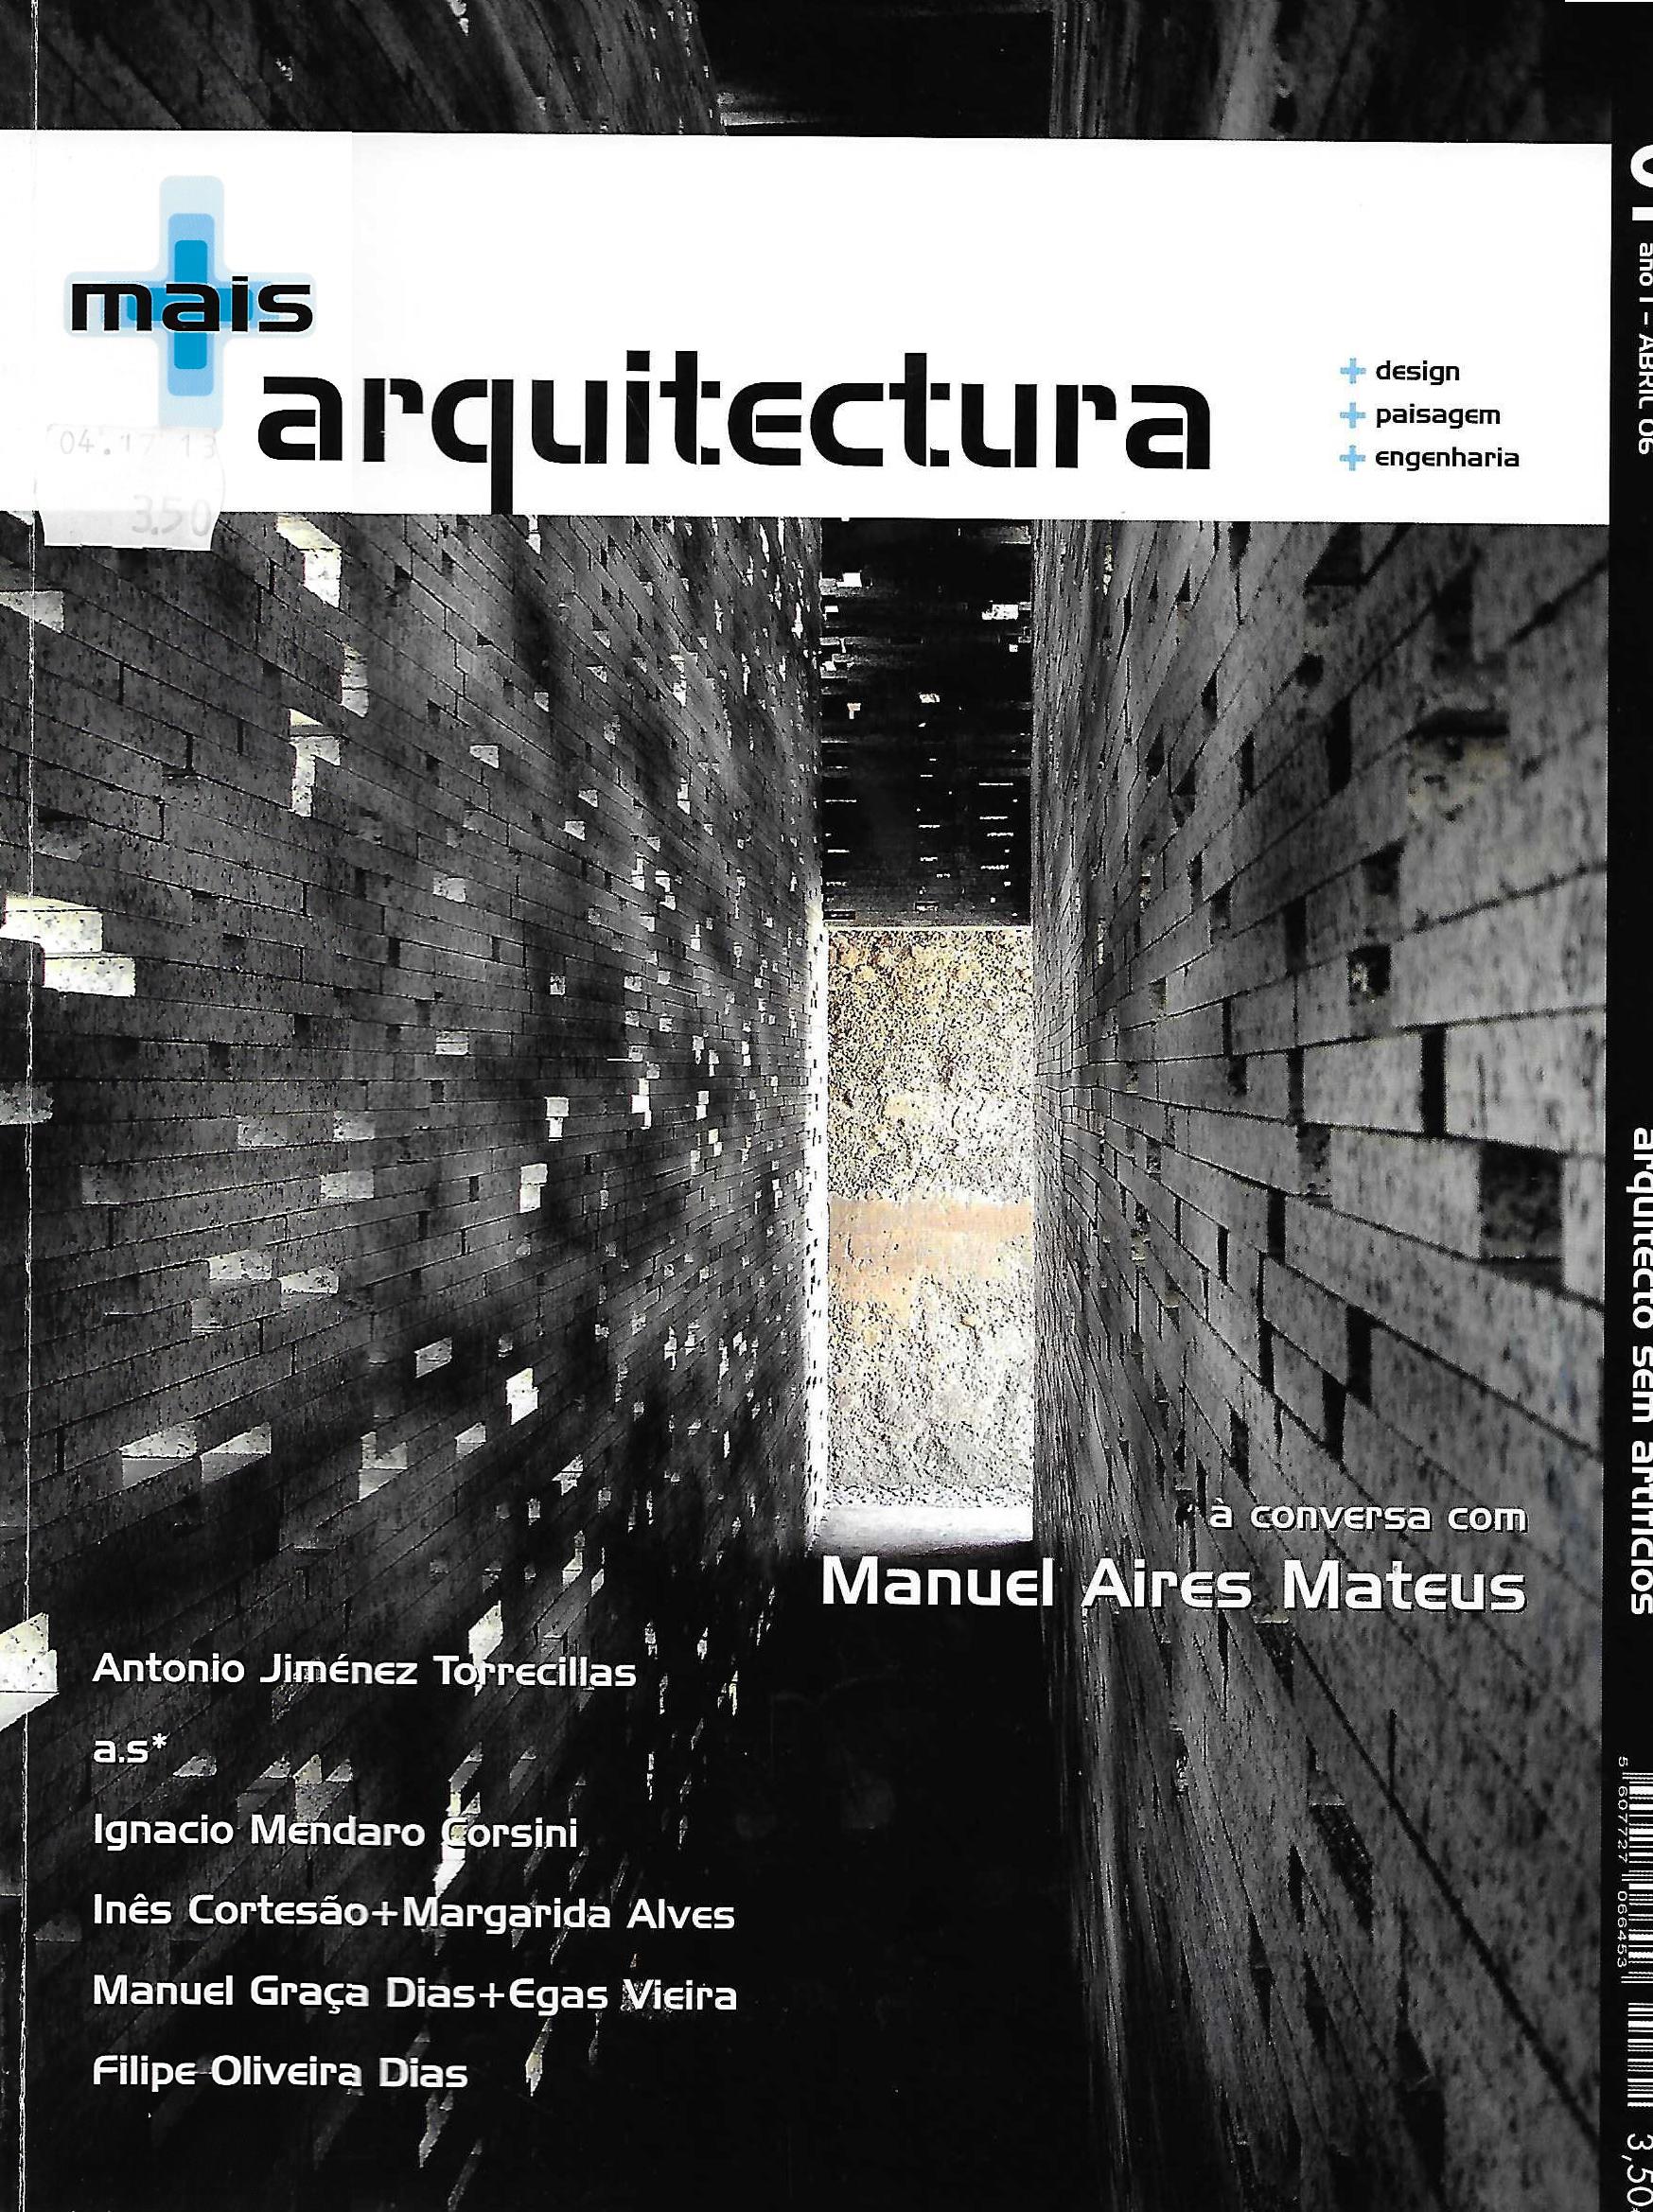 SANTACRUZ-MAIS ARQUITECTURA.jpg